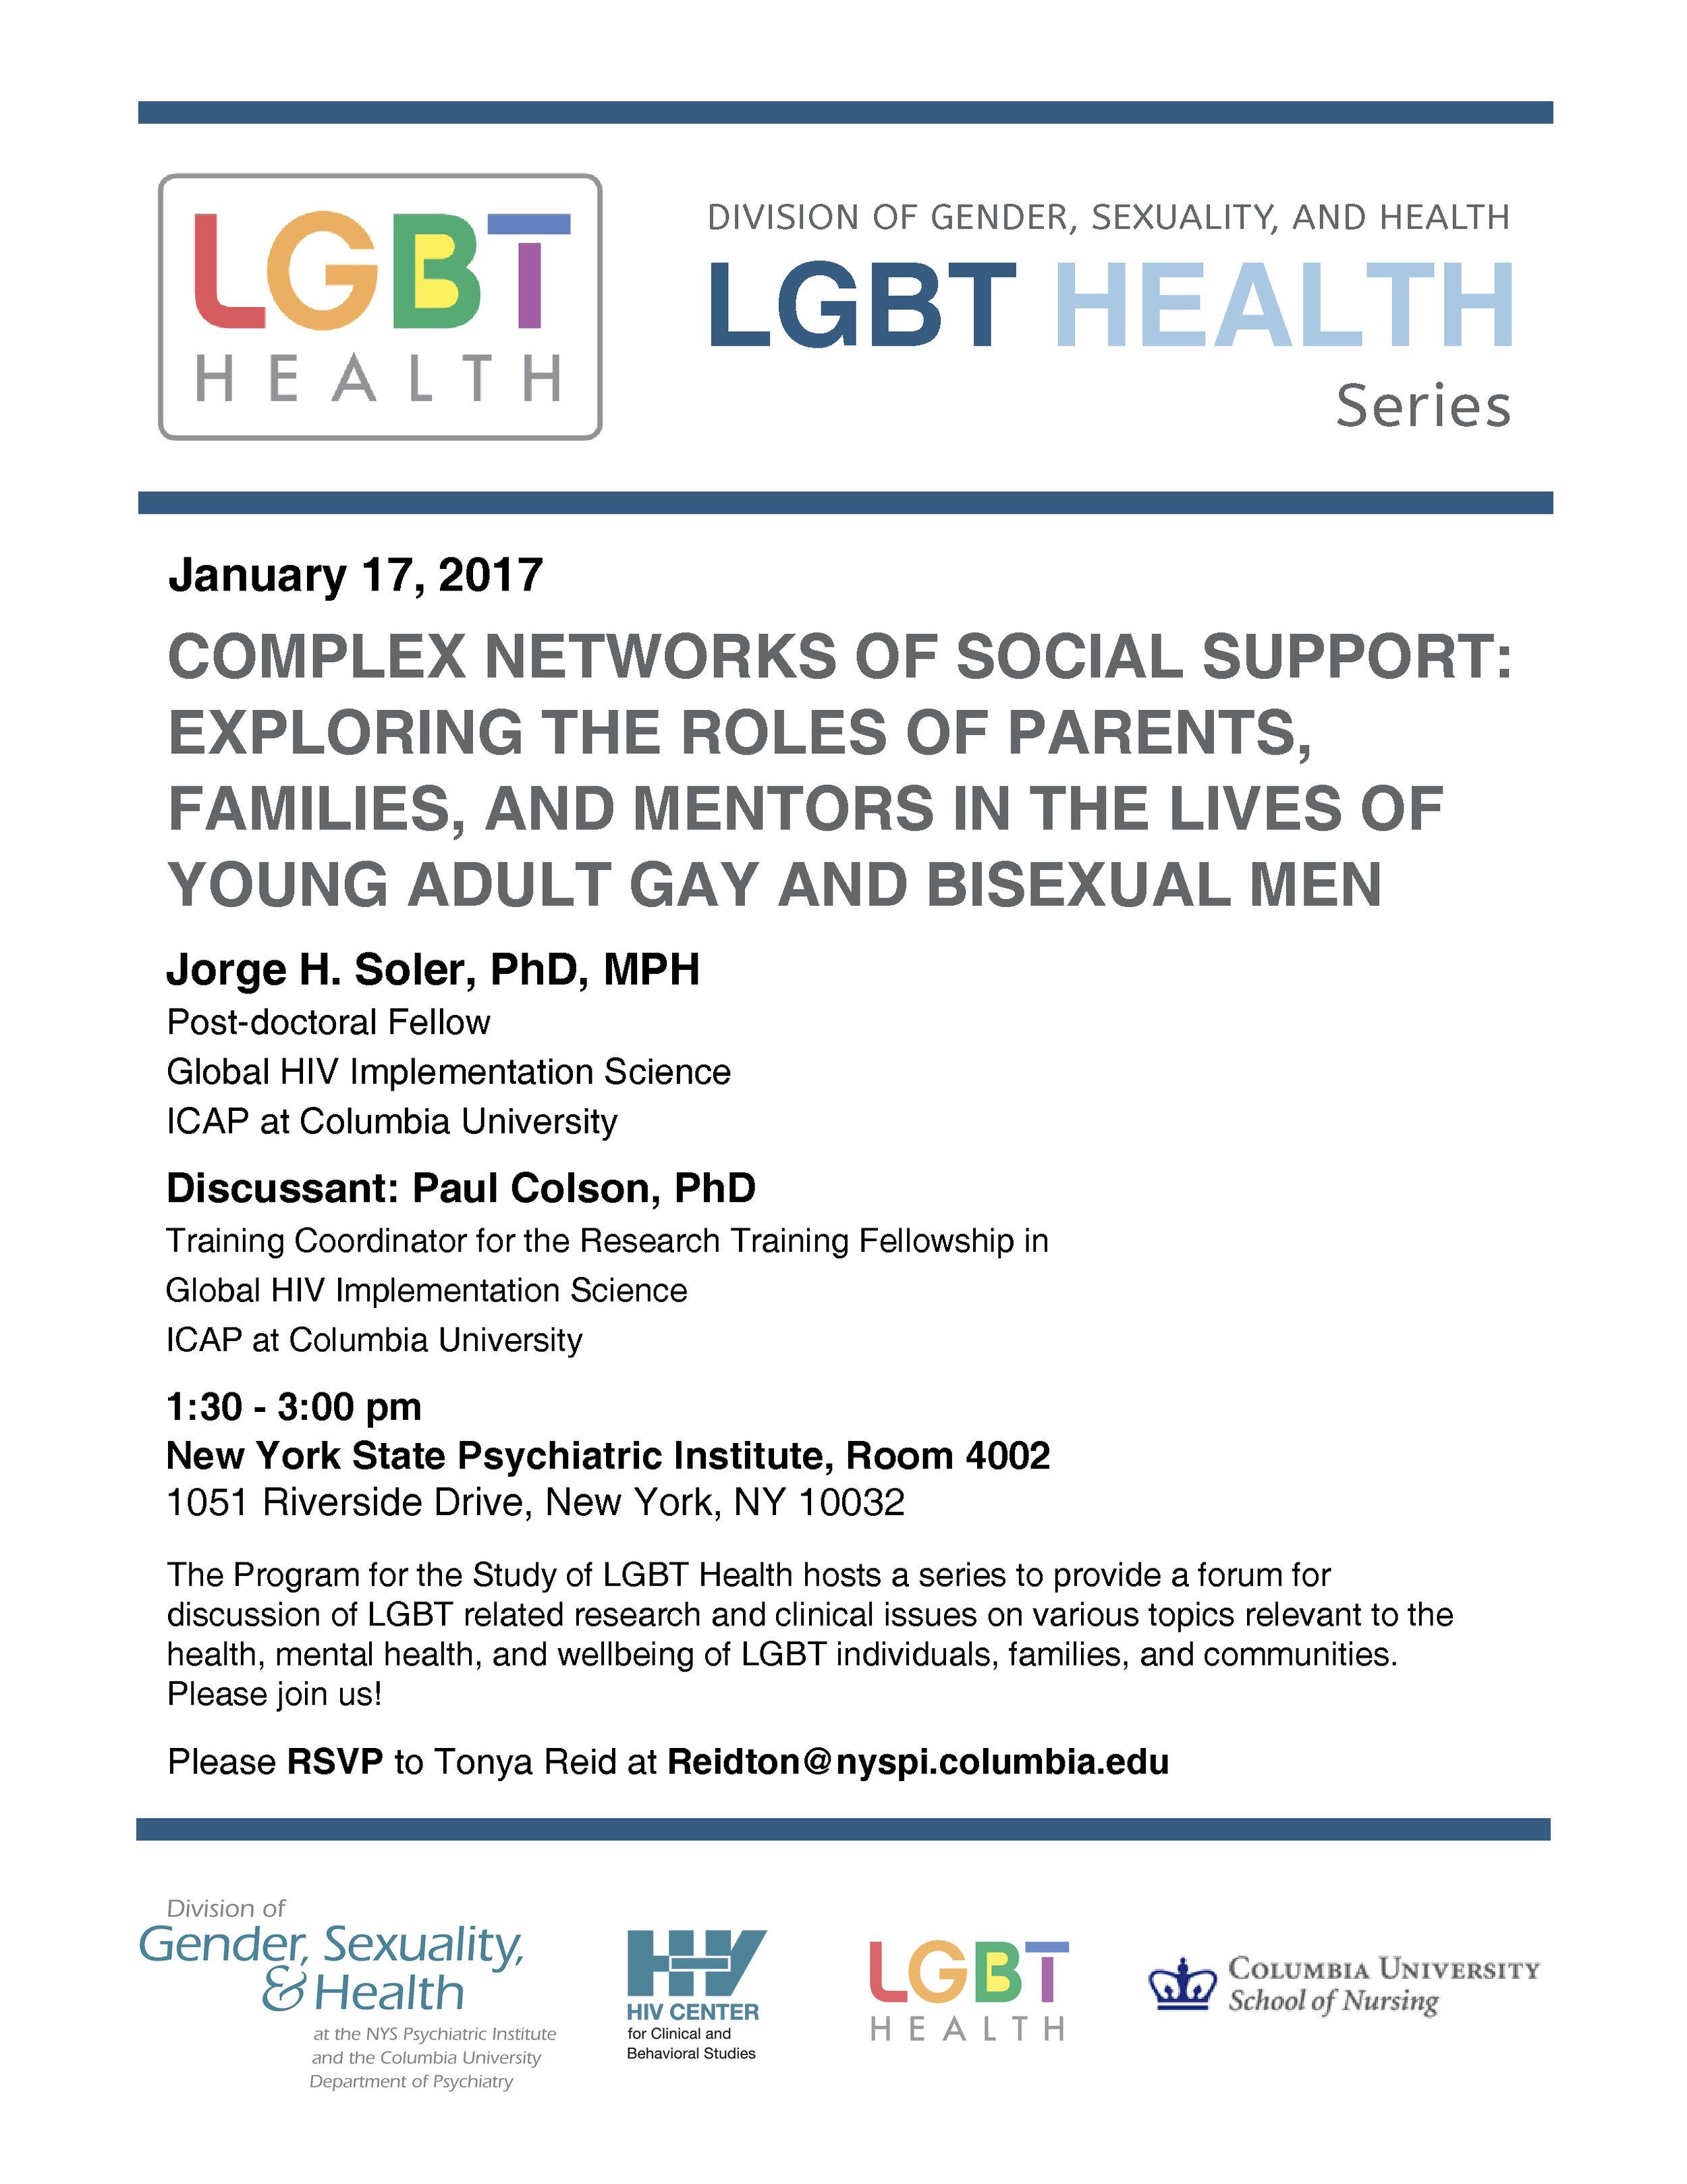 LGBT Health Series January 17 2017.jpg